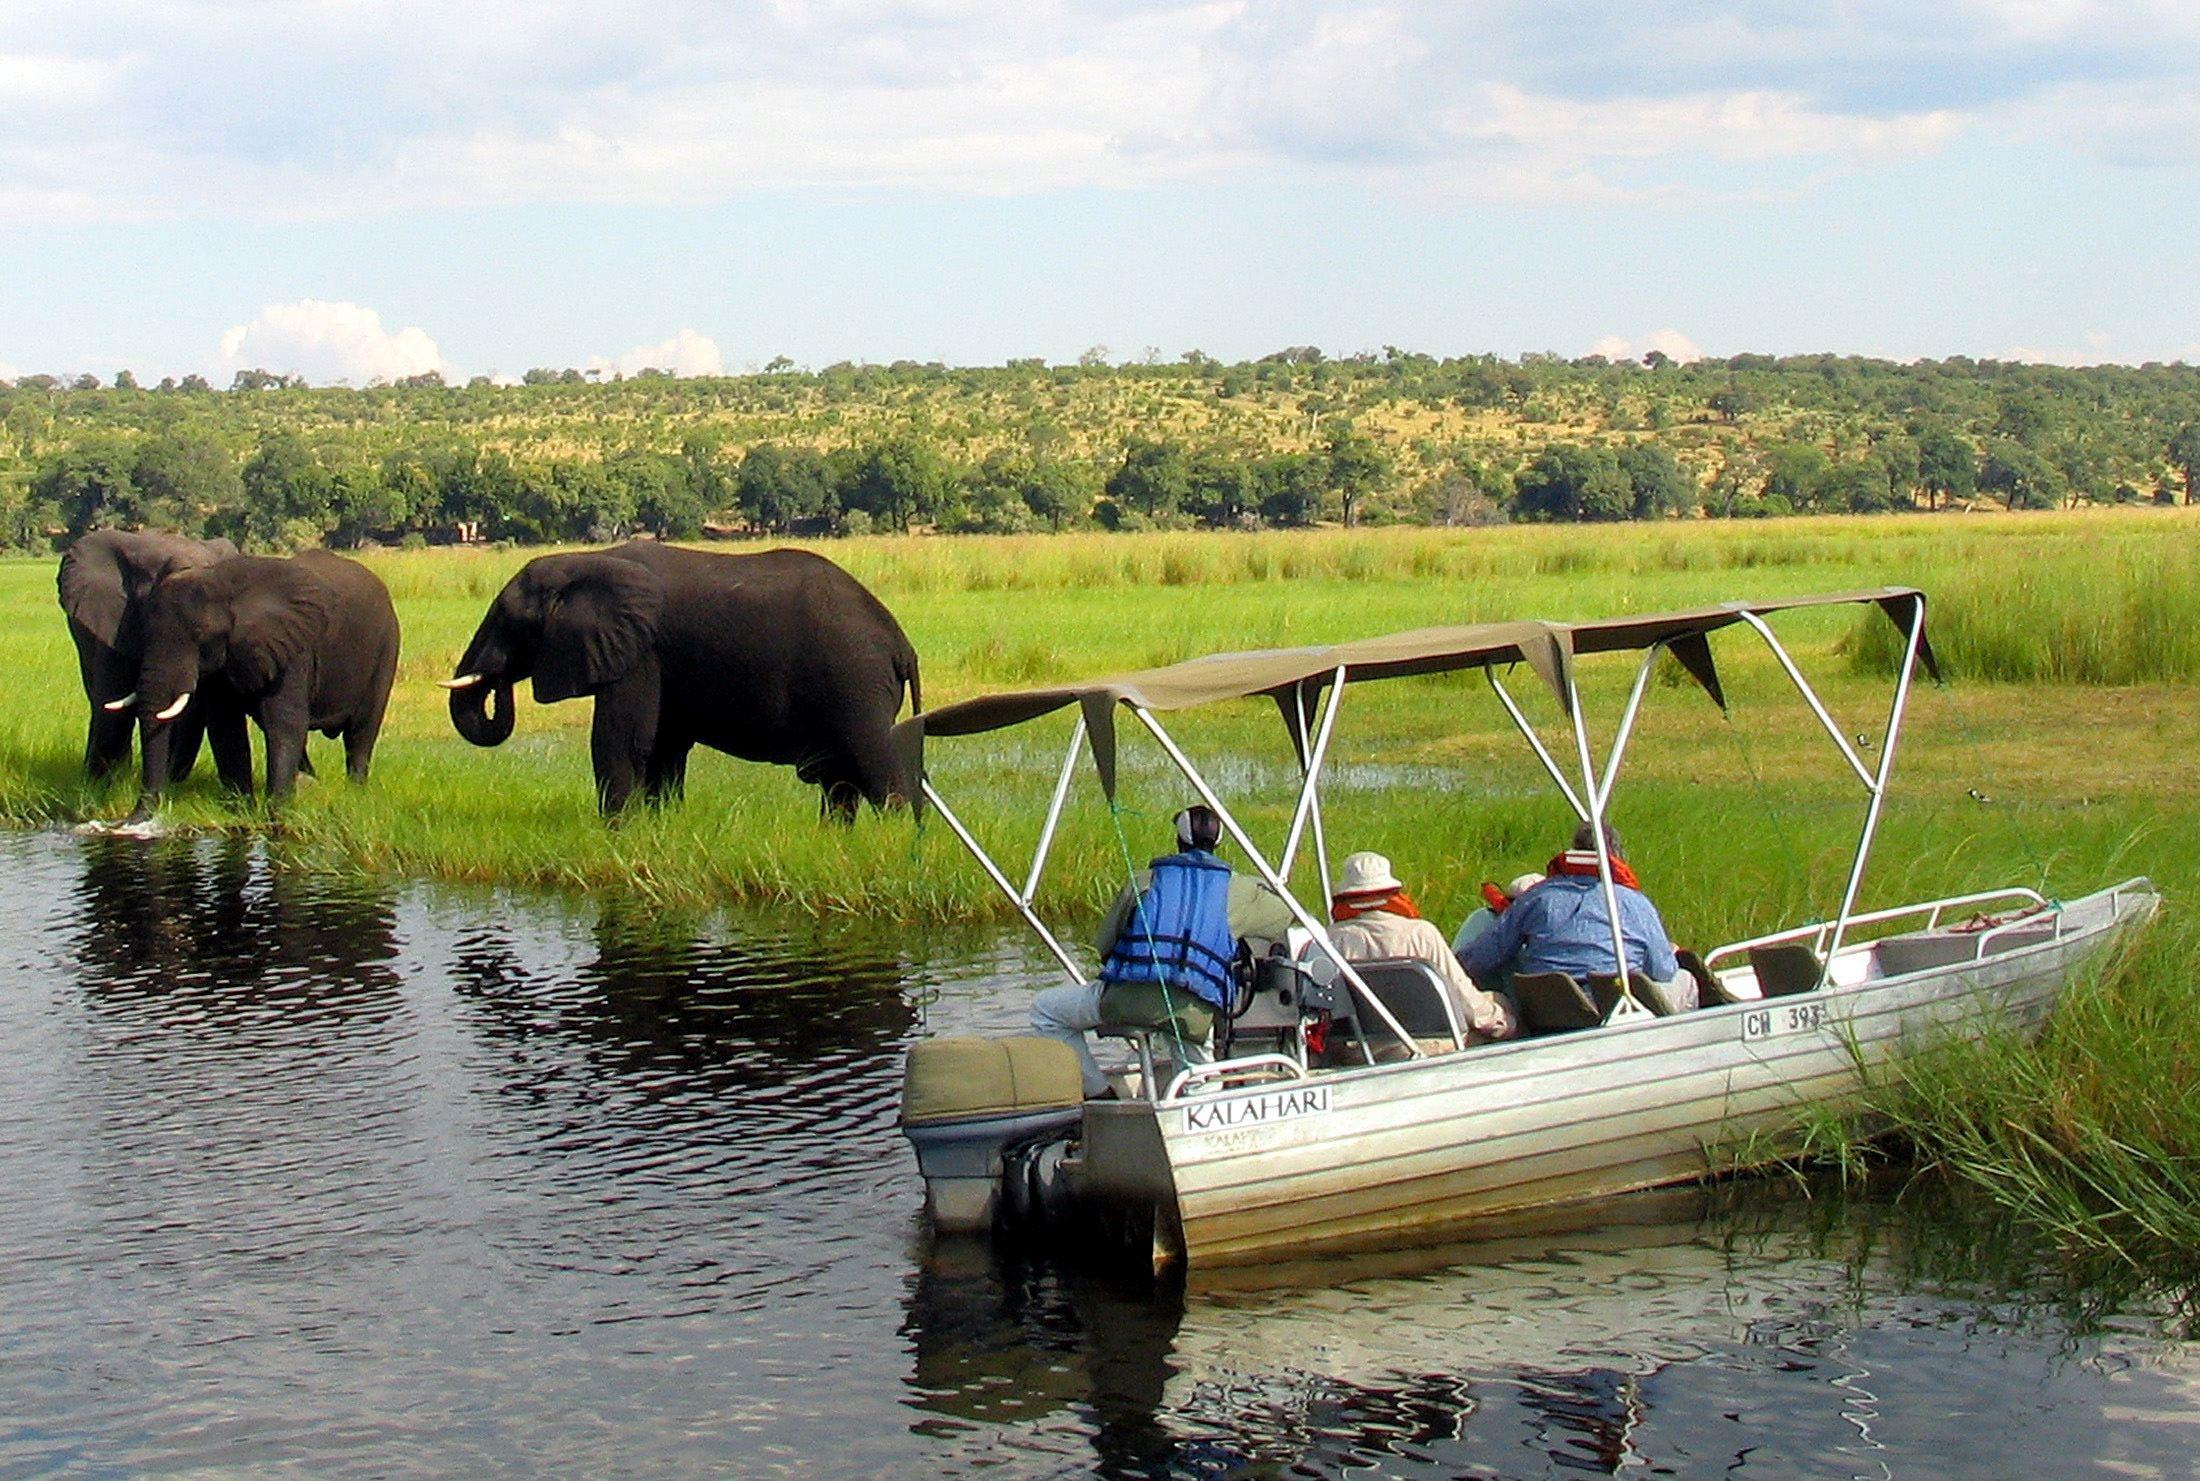 Foreign tourists in safari riverboats observe elephants along the Chobe river bank near Botswana's northern border where Zimbabwe, Zambia and Namibia meet